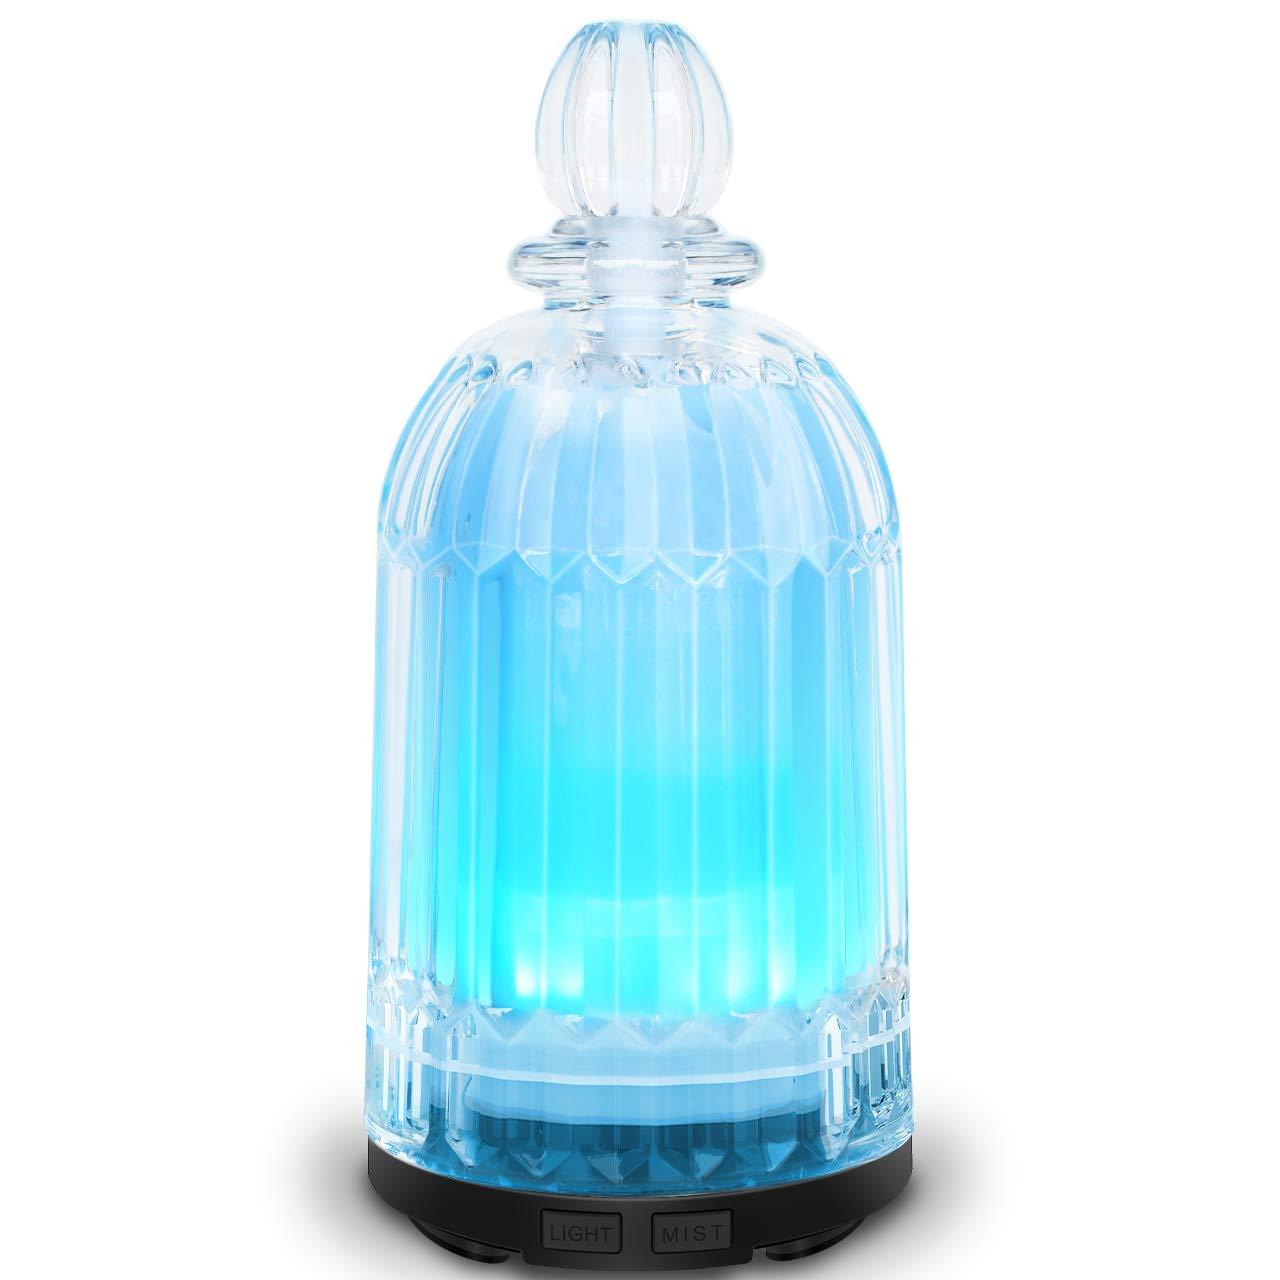 Duftöl Diffuser mit Beleuchtung